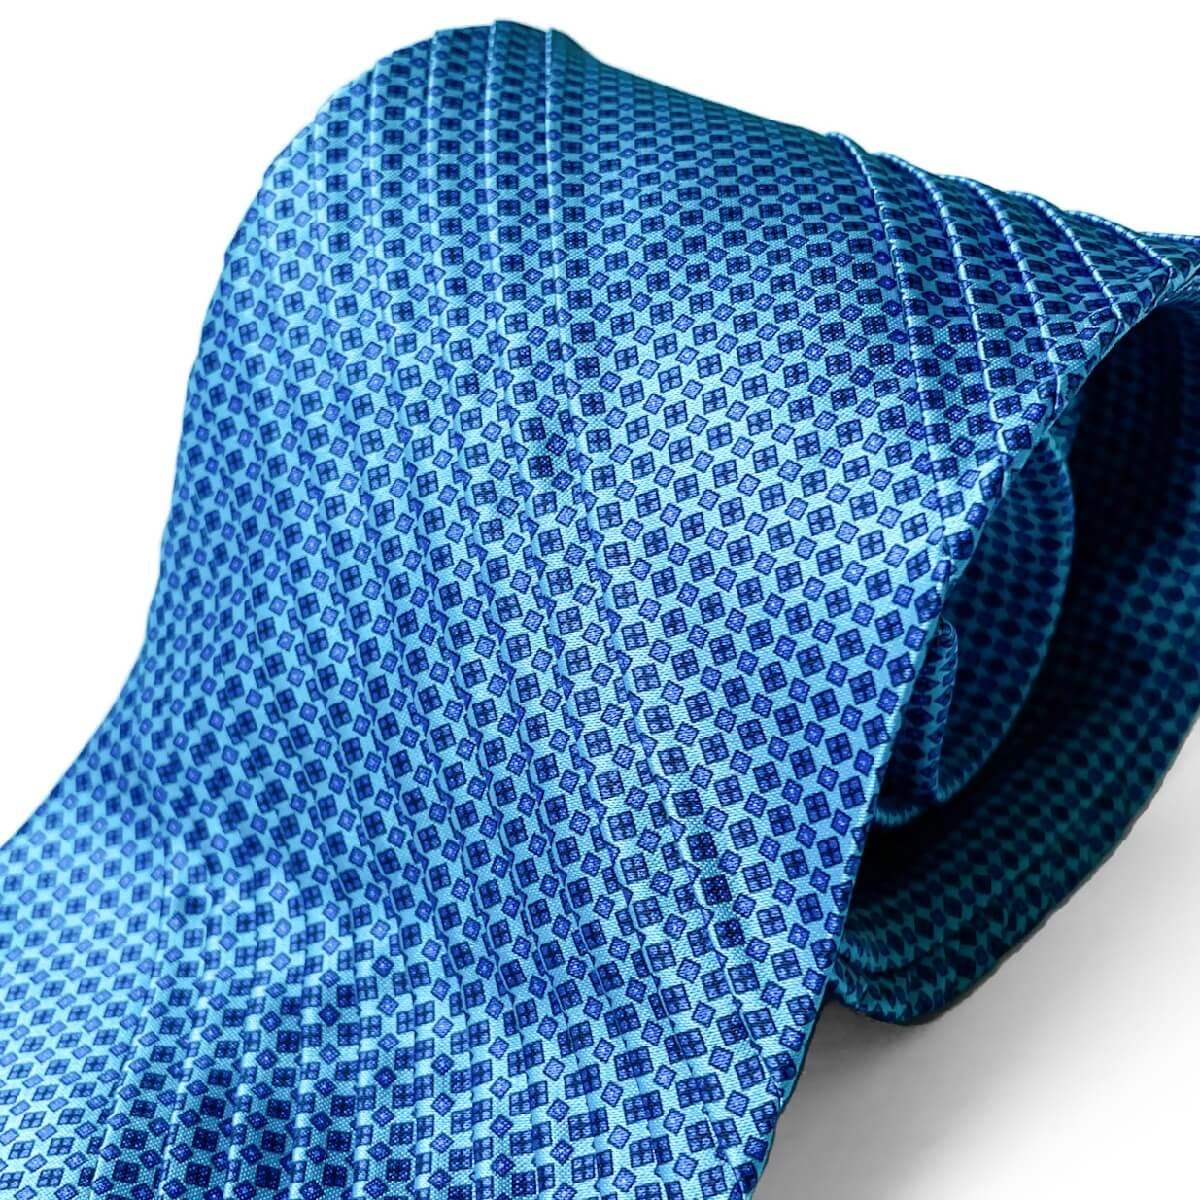 STEFANO RICCI(ステファノリッチ) ネクタイ プリーツ プリーツタイ ブルーグリーン 青緑 ステファノリッチネクタイ